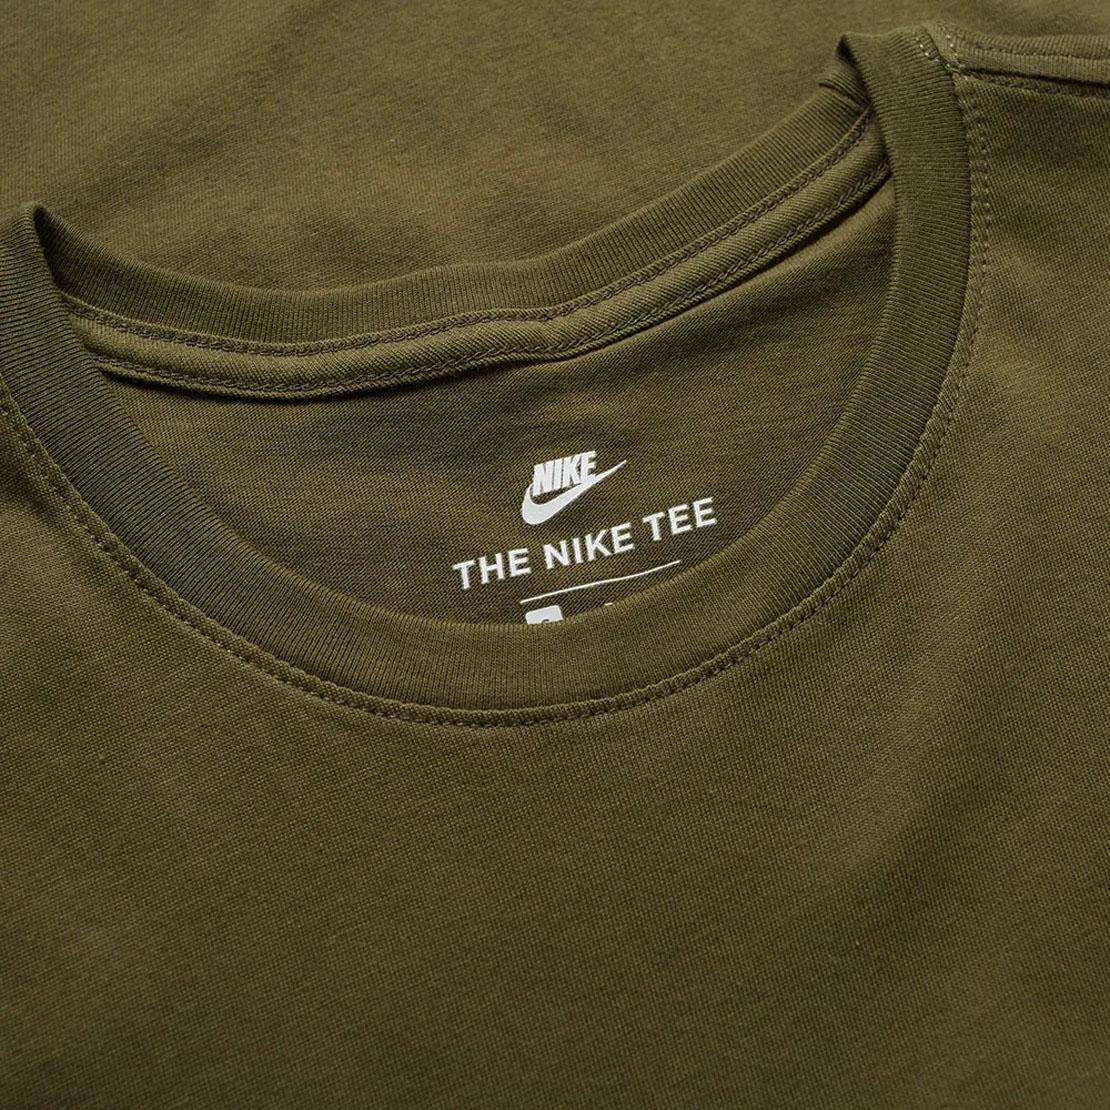 97a2bd0fdbae Nike Air Max Mens Green Camo Tshirt Athletic Cut Jersey Cotton Fitness Tee